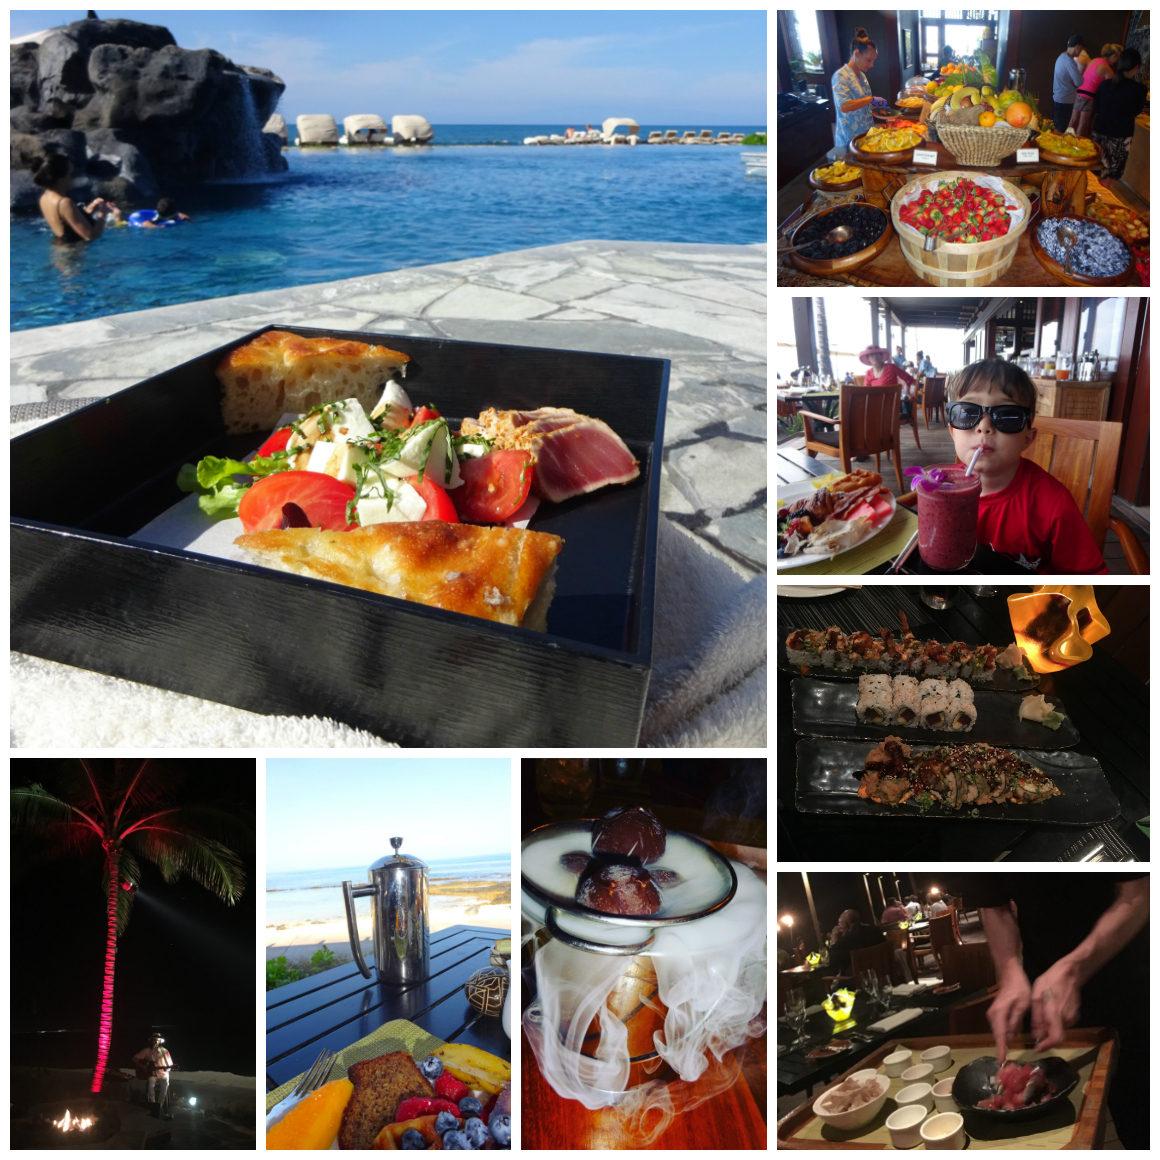 Four Seasons Hualalai: The Ultimate Hawaiian Luxury Family Vacation